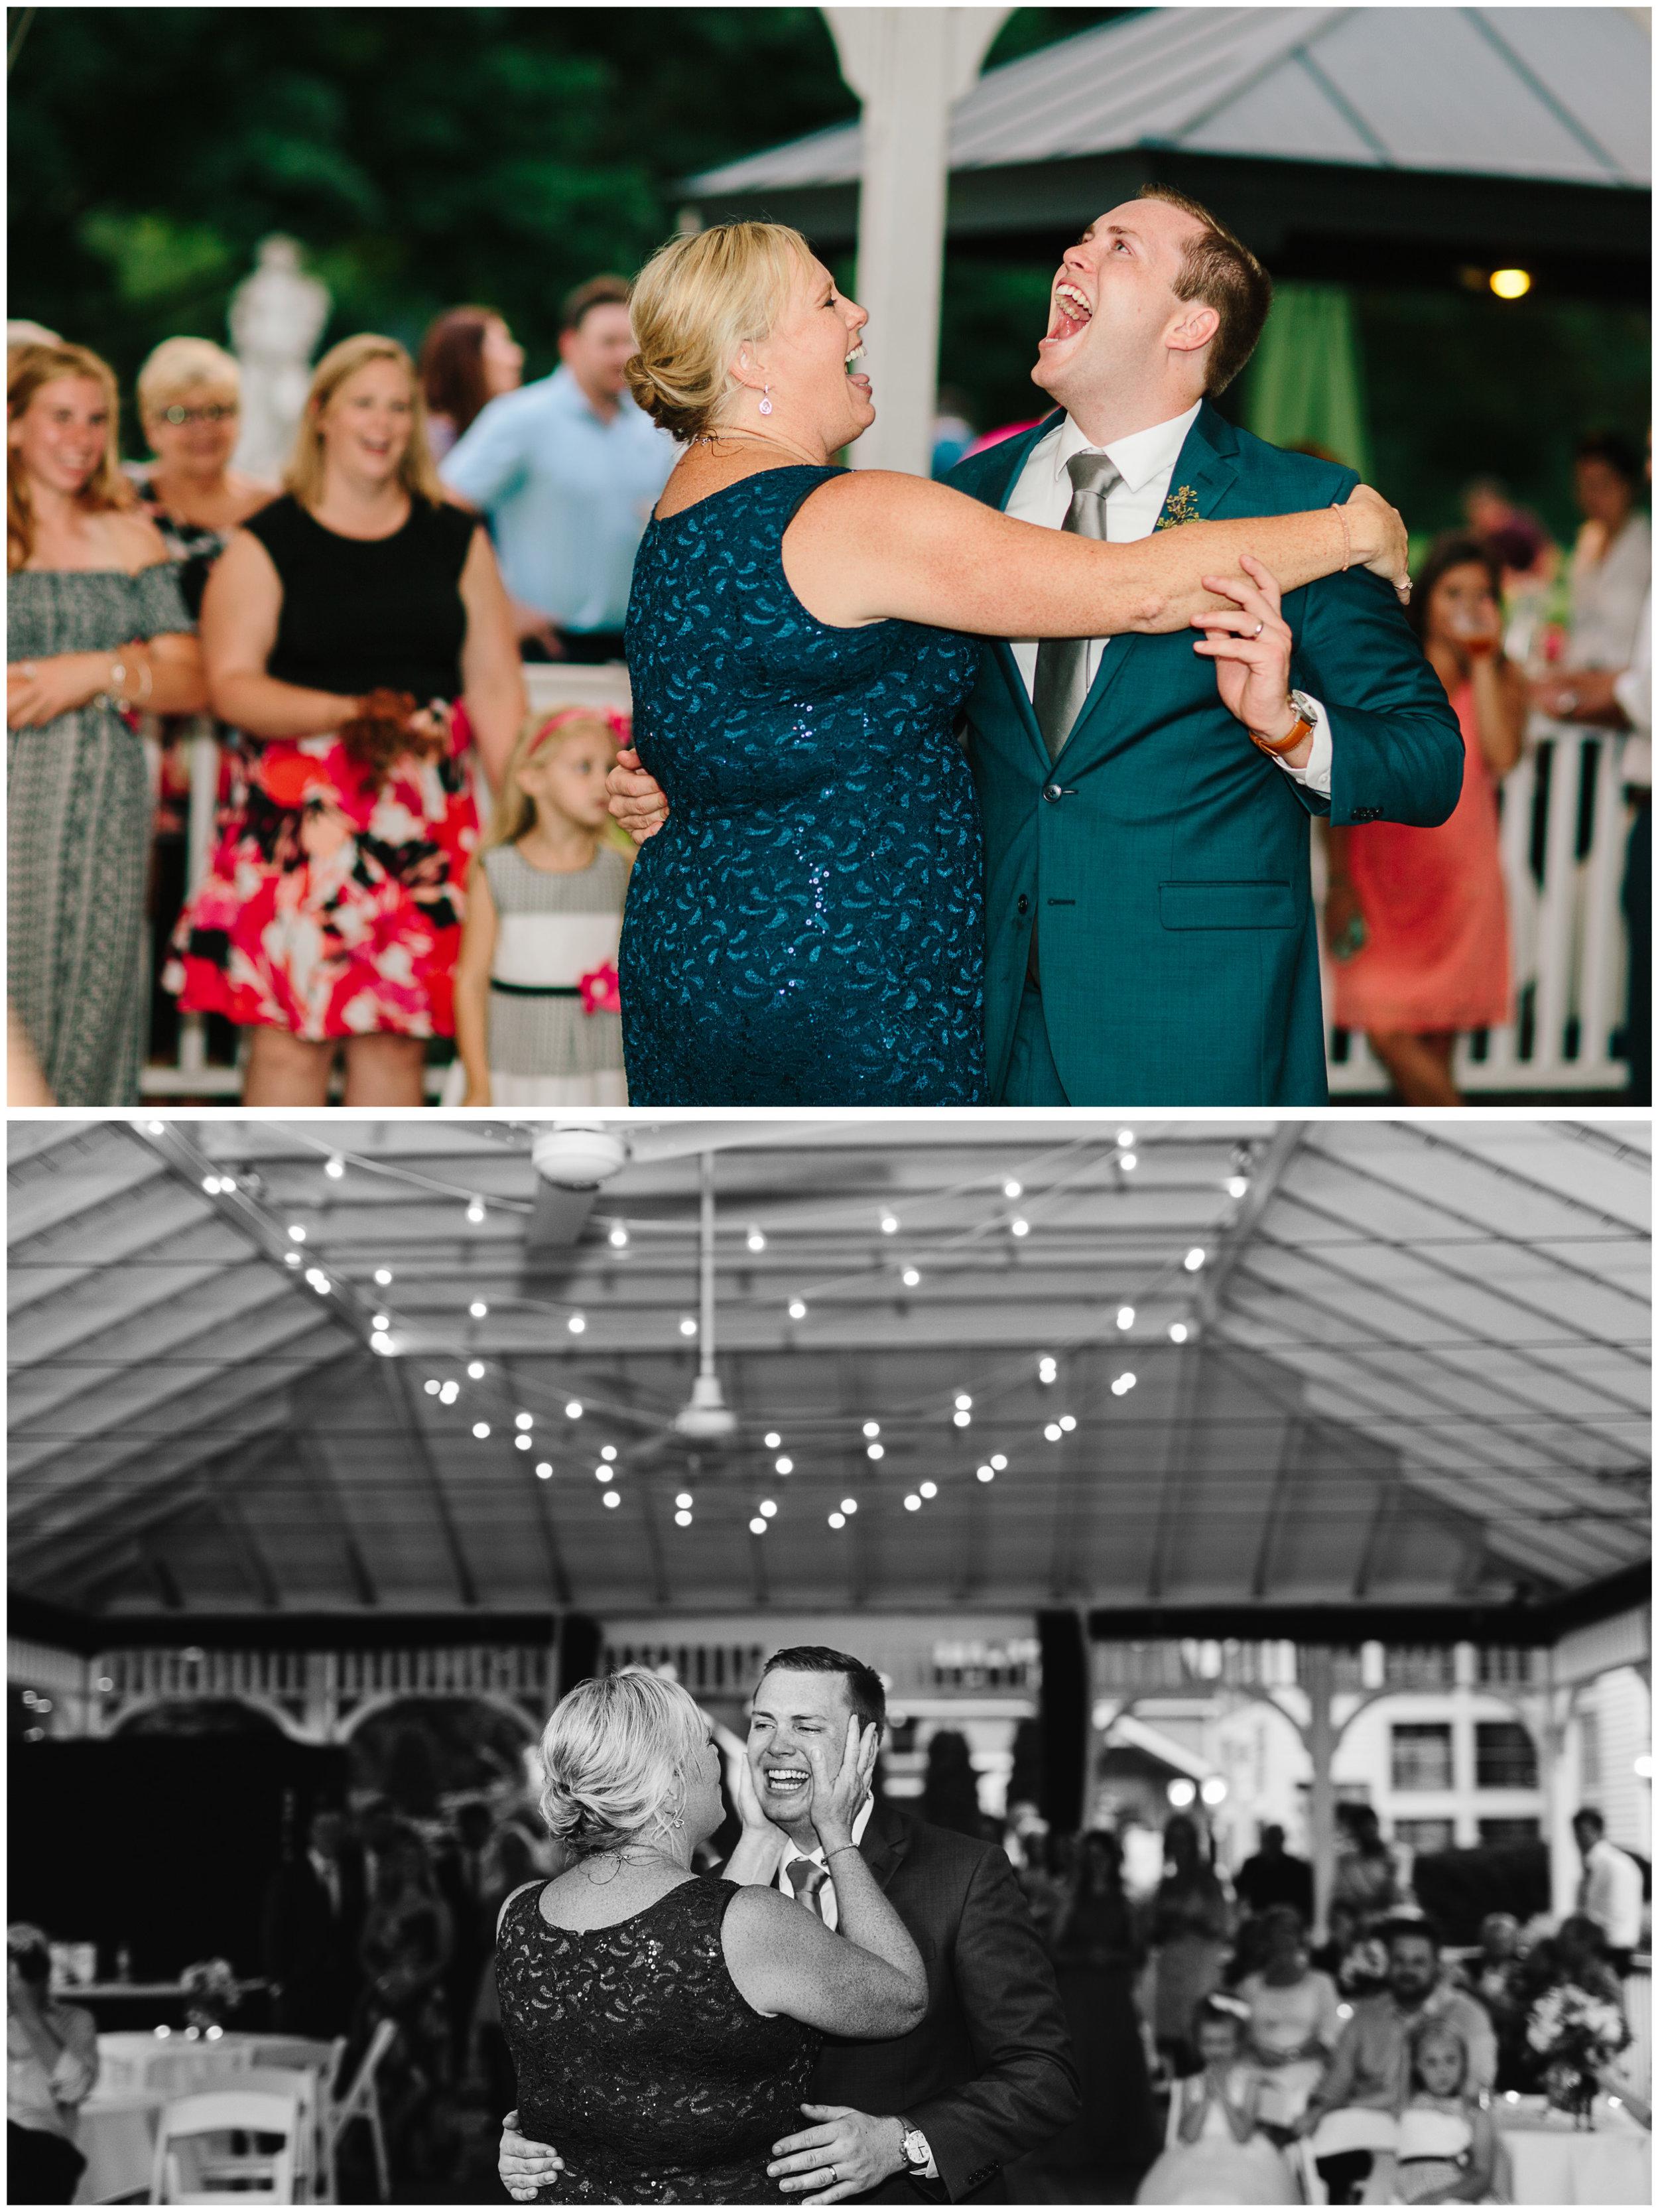 ann_arbor_michigan_wedding_94.jpg